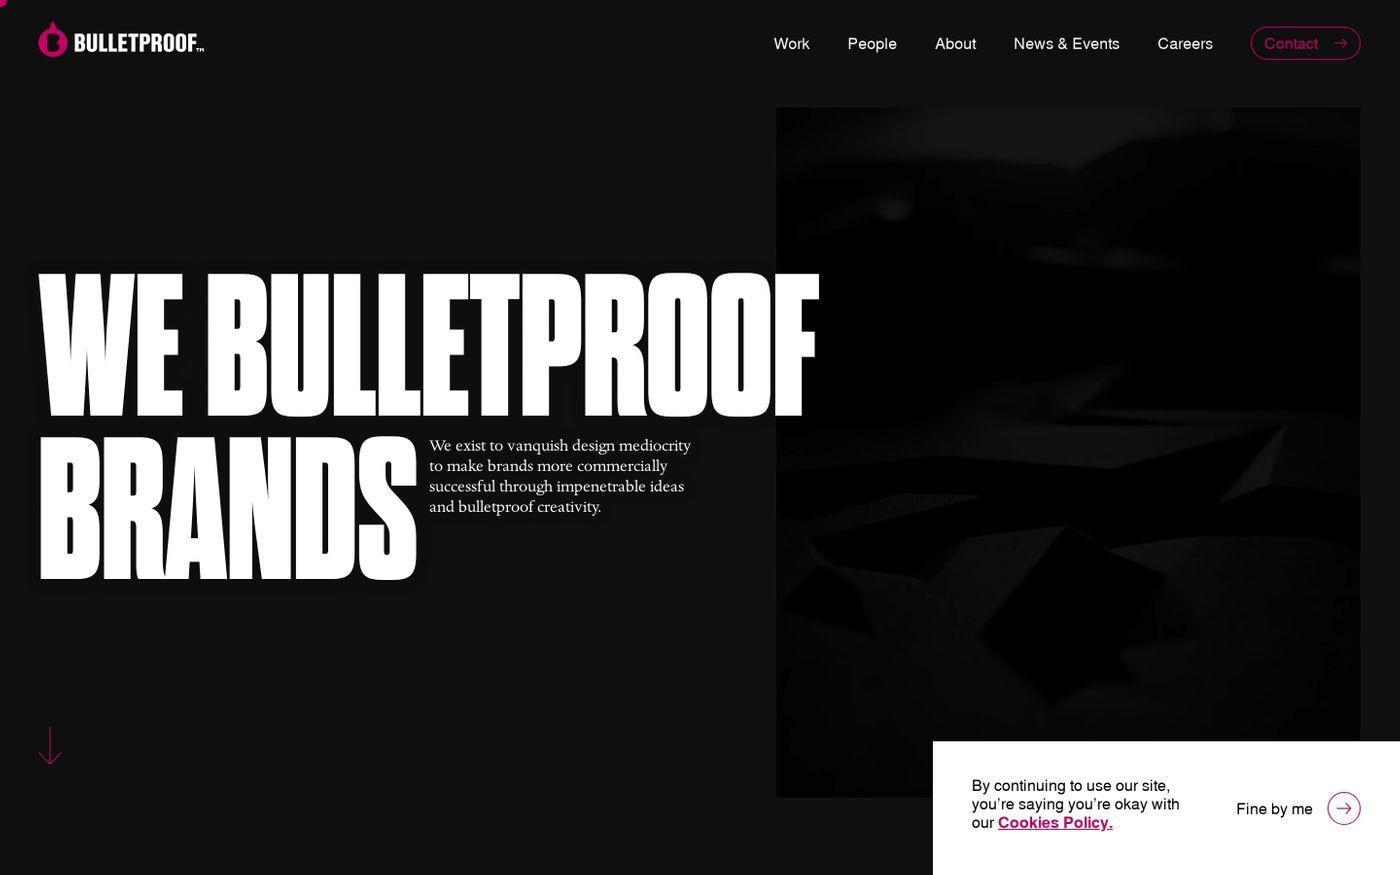 Screenshot of Bulletproof website